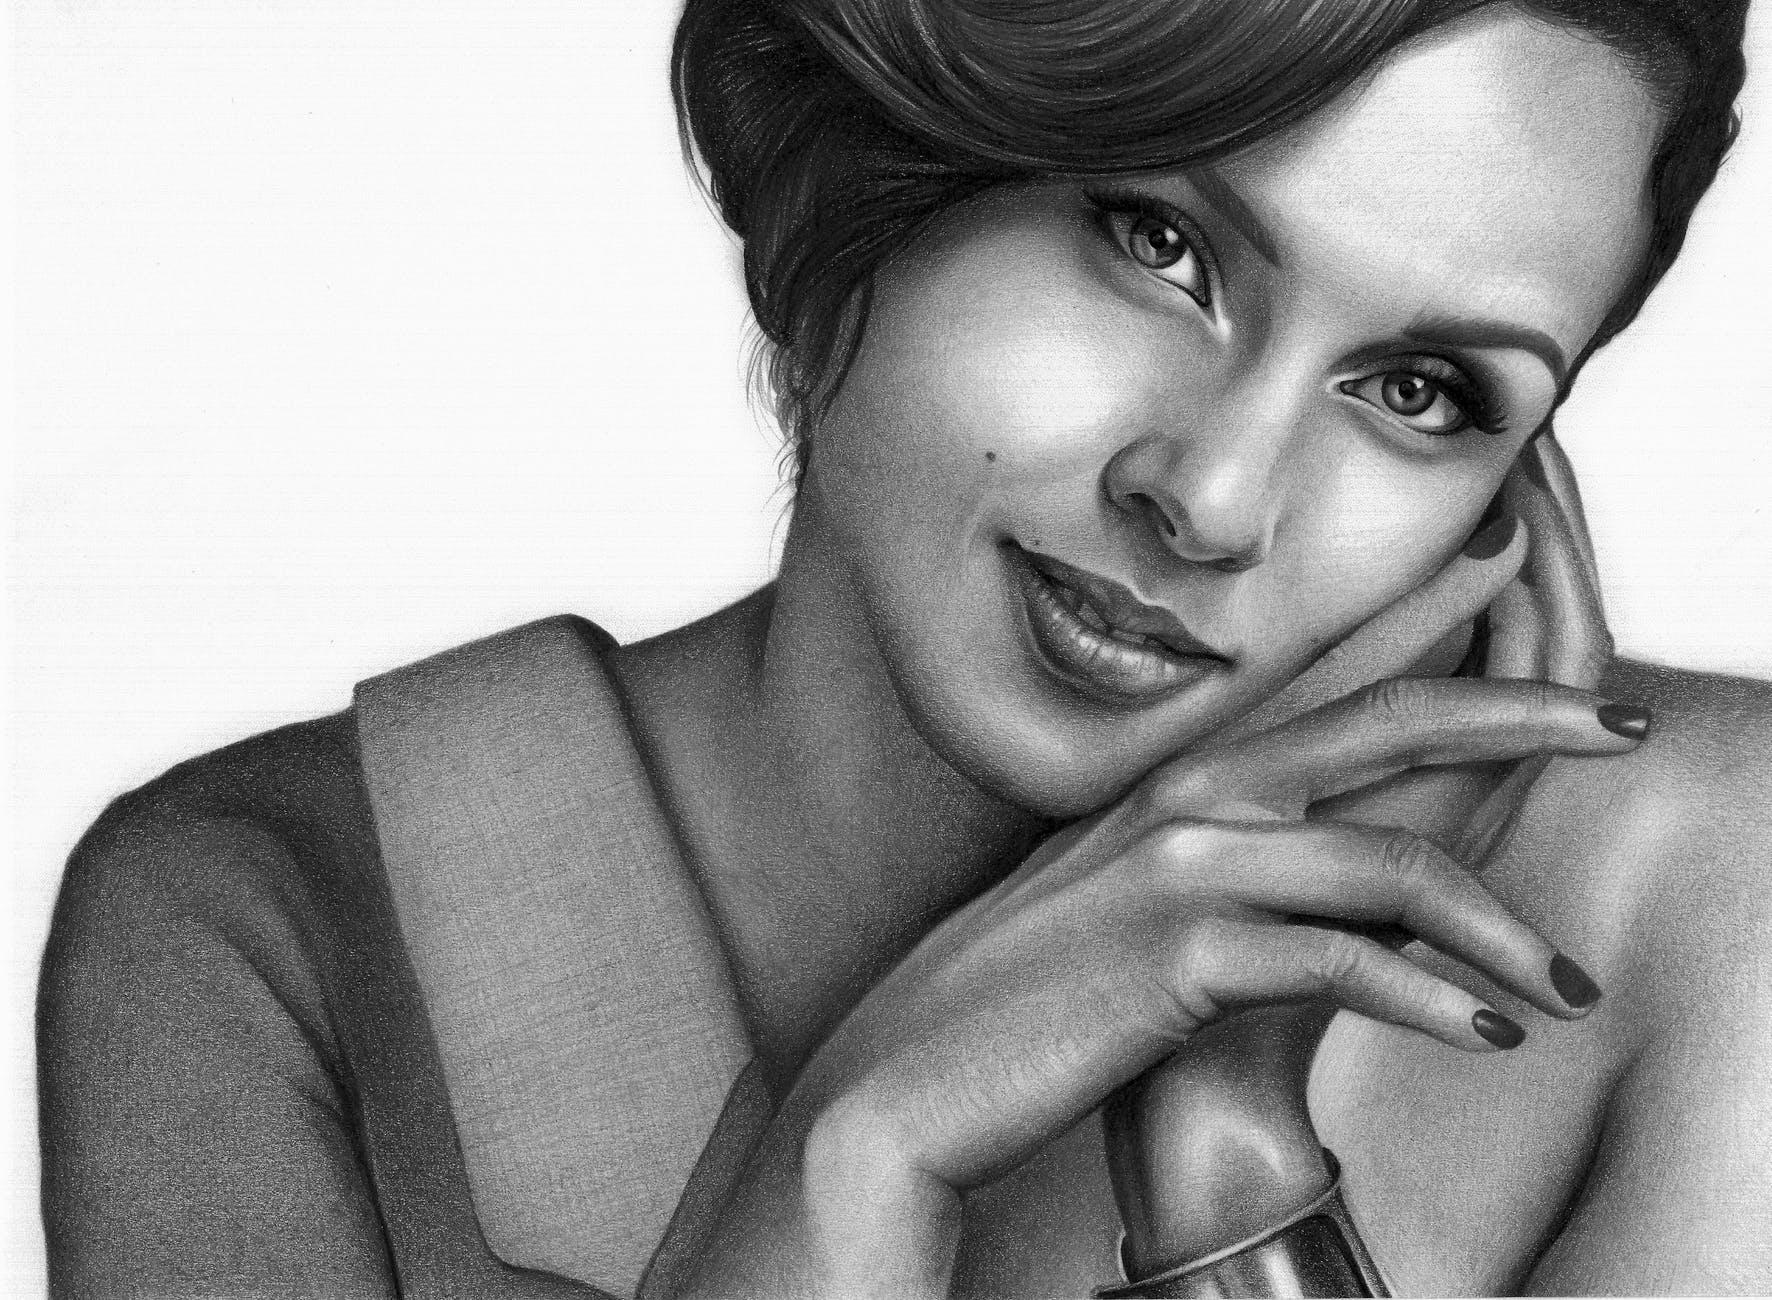 alicia-key-drawing-draw-portrait